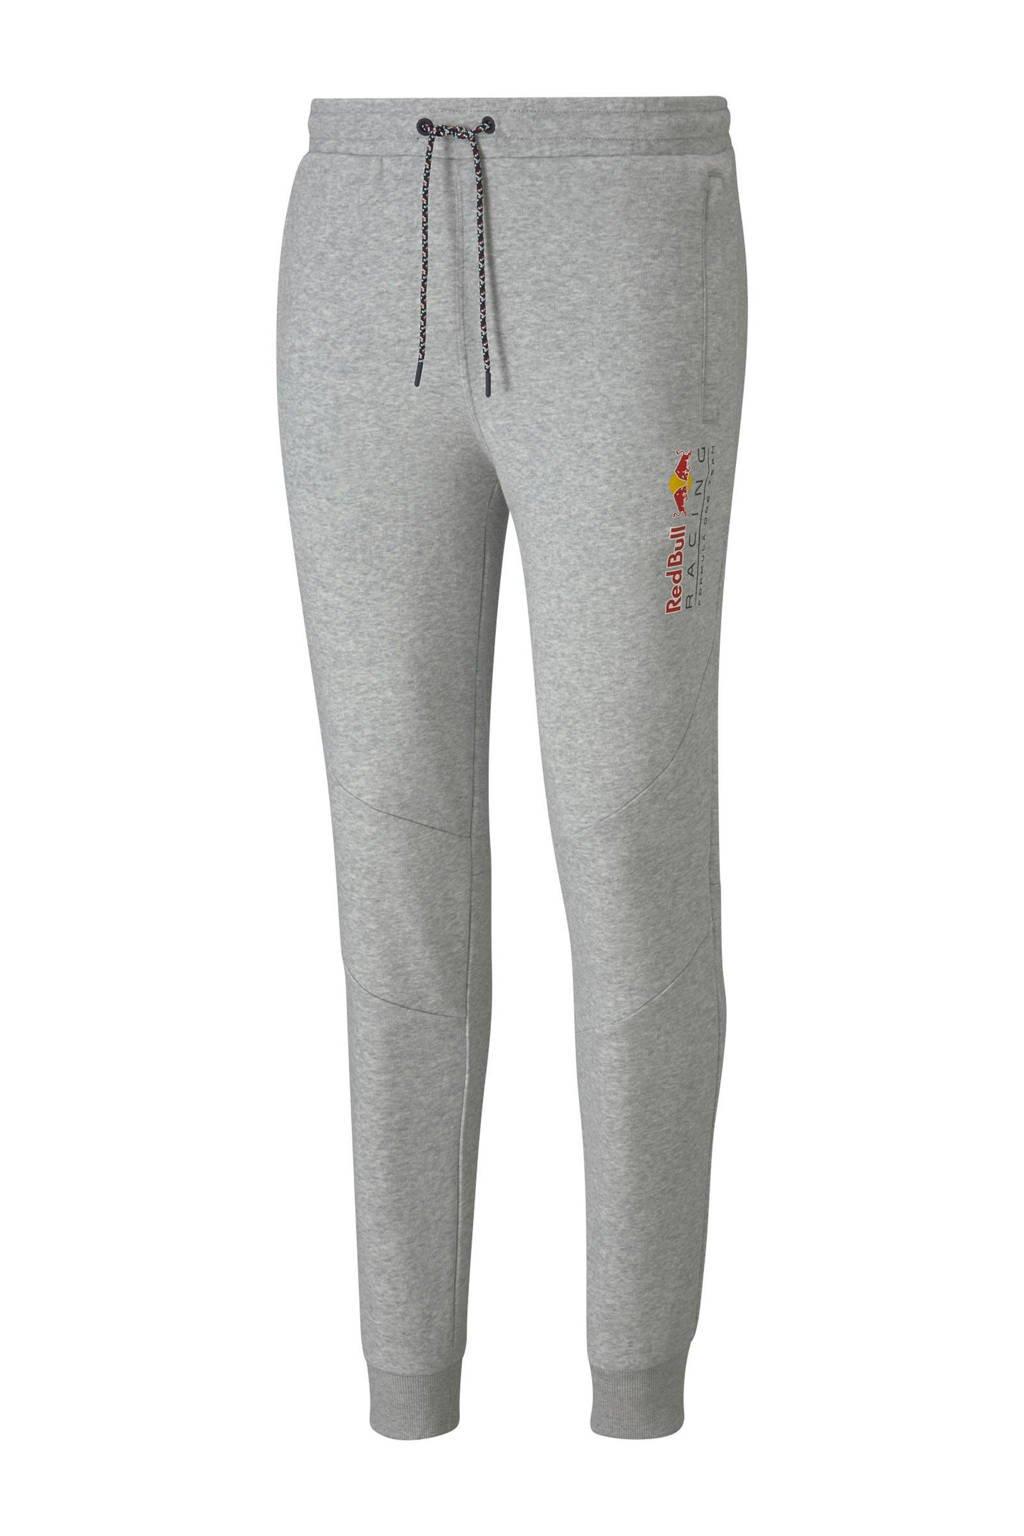 Puma   Red Bull Racing joggingbroek grijs melange, Grijs melange